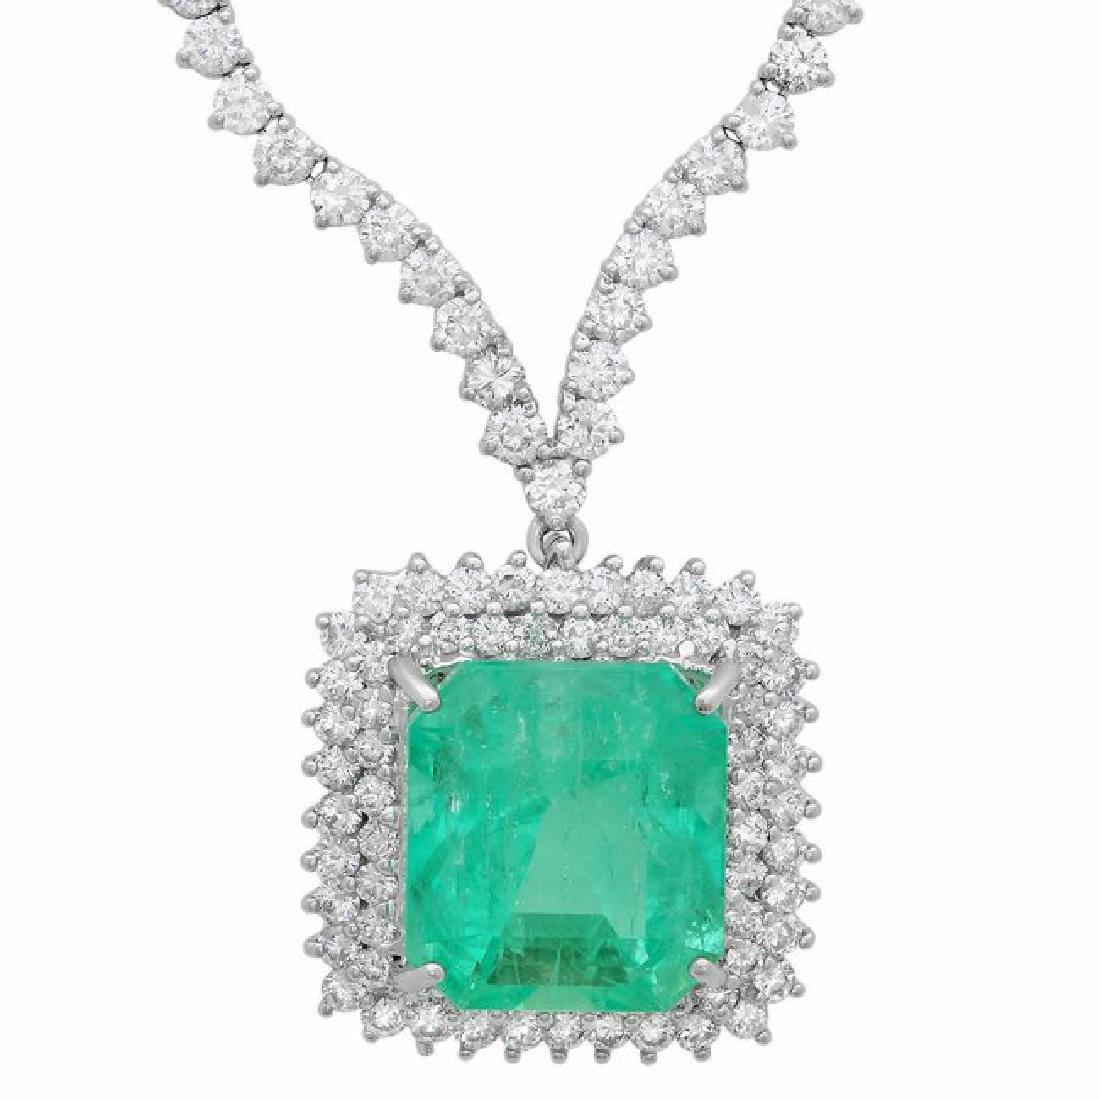 18k Gold 17.00ct Emerald 10.70ct Diamond Necklace - 3